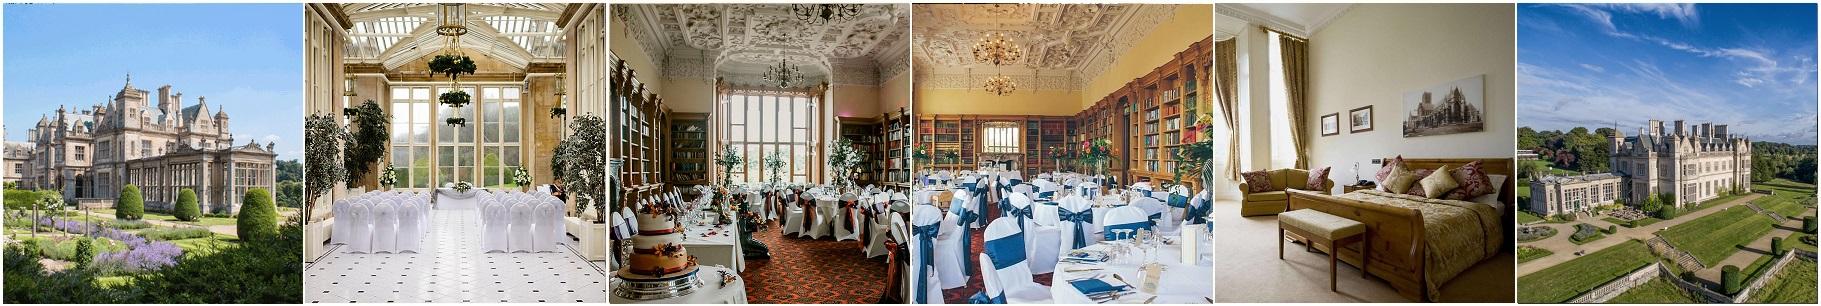 Lincolnshire Wedding Venues